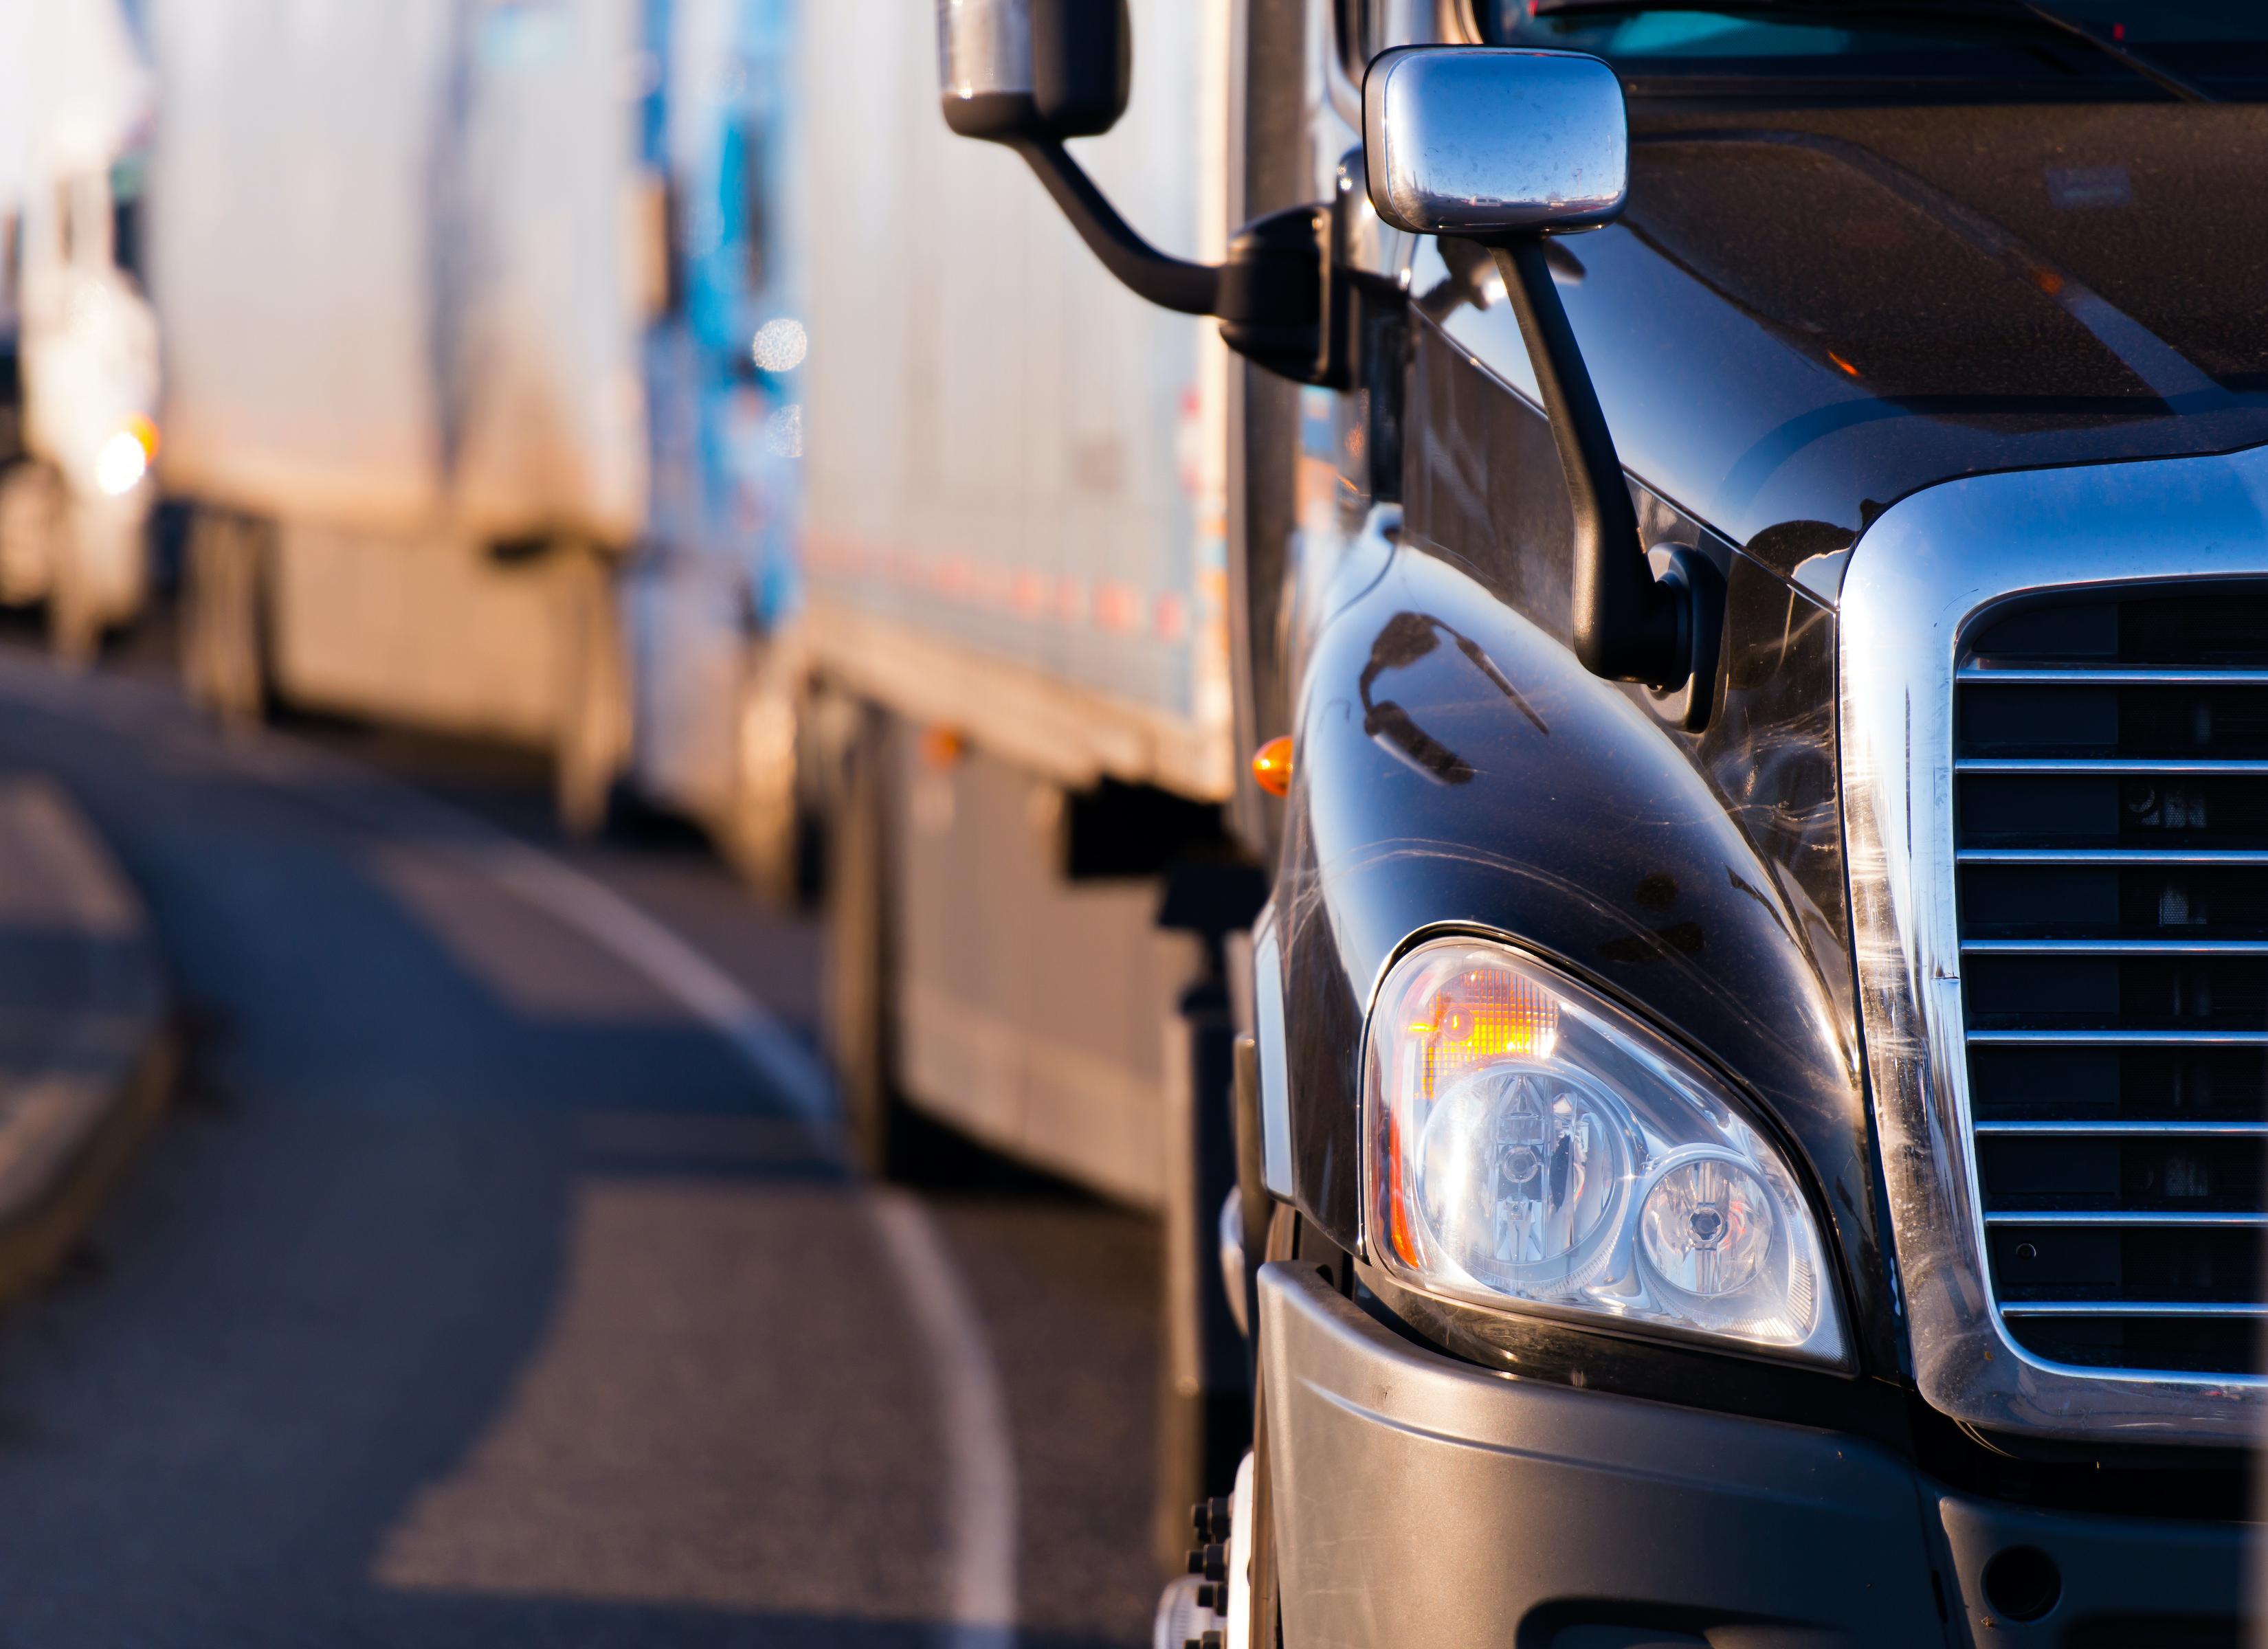 Front view of semi trucks